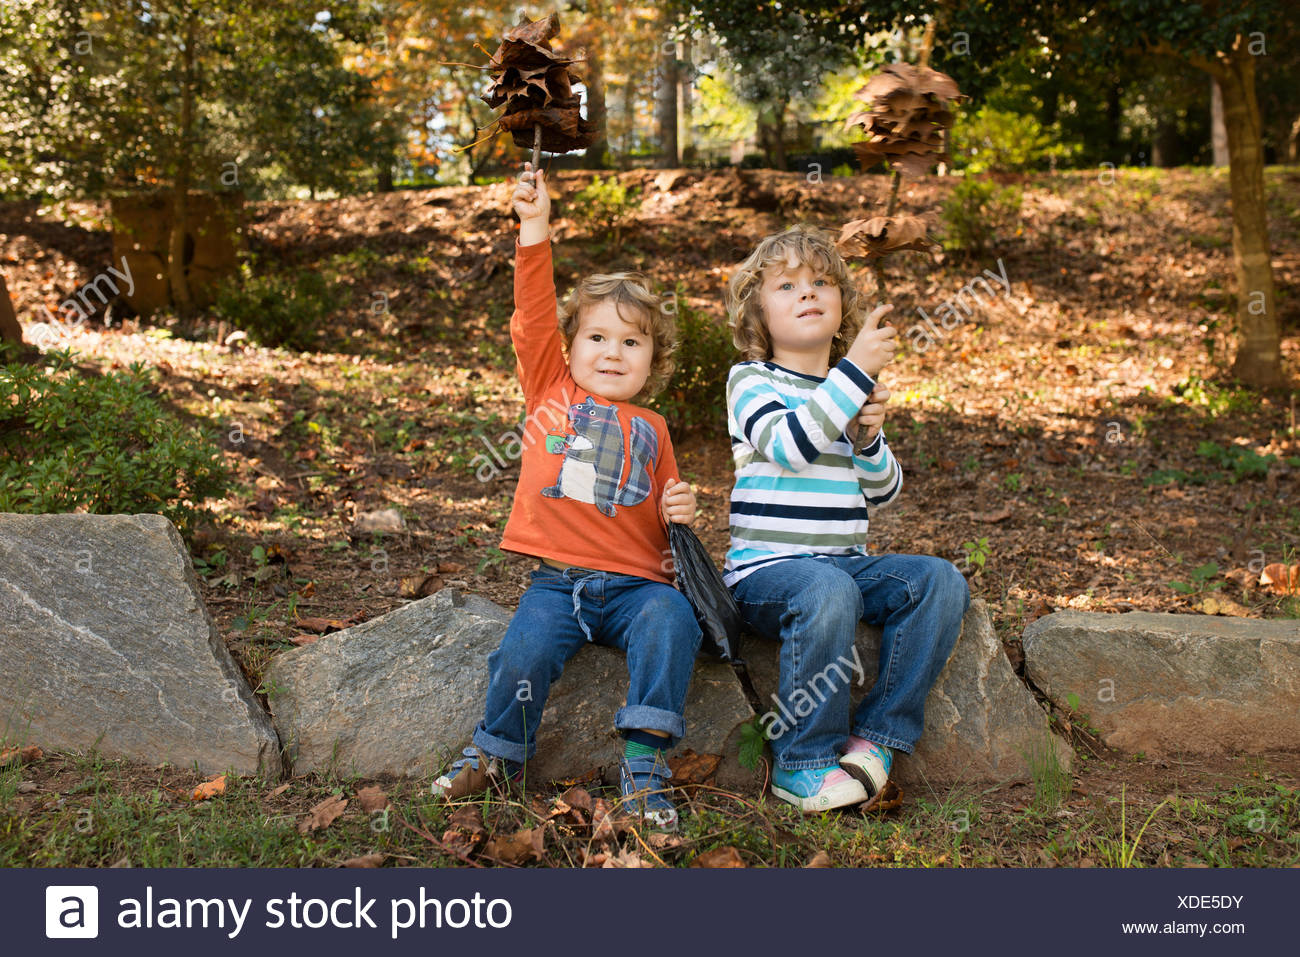 Boys (2-5) having fun in autumn park - Stock Image